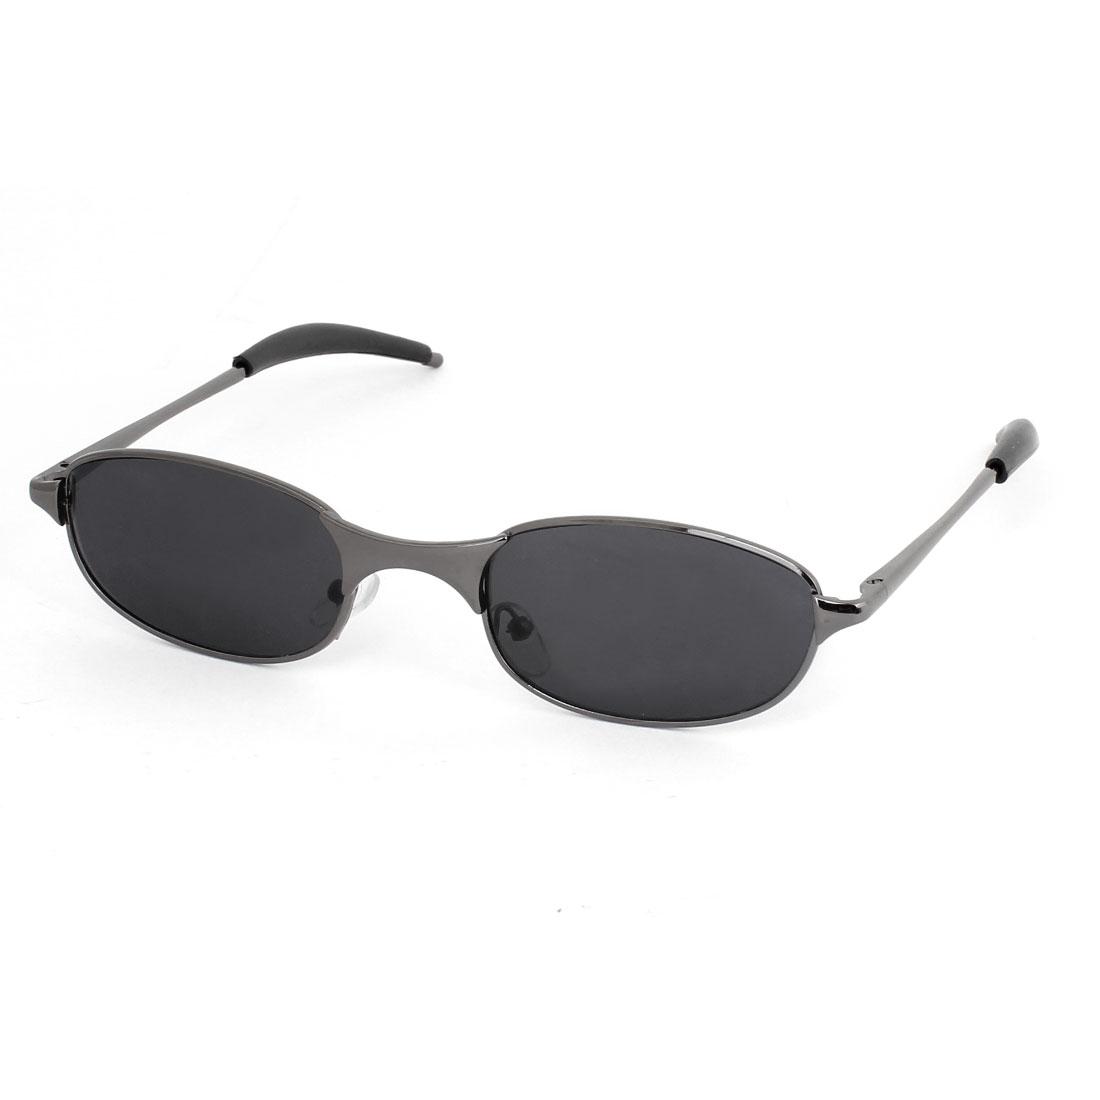 Single Bridge Colored Lens Full Rim Driving Sunglasses Glasses w Case Holder